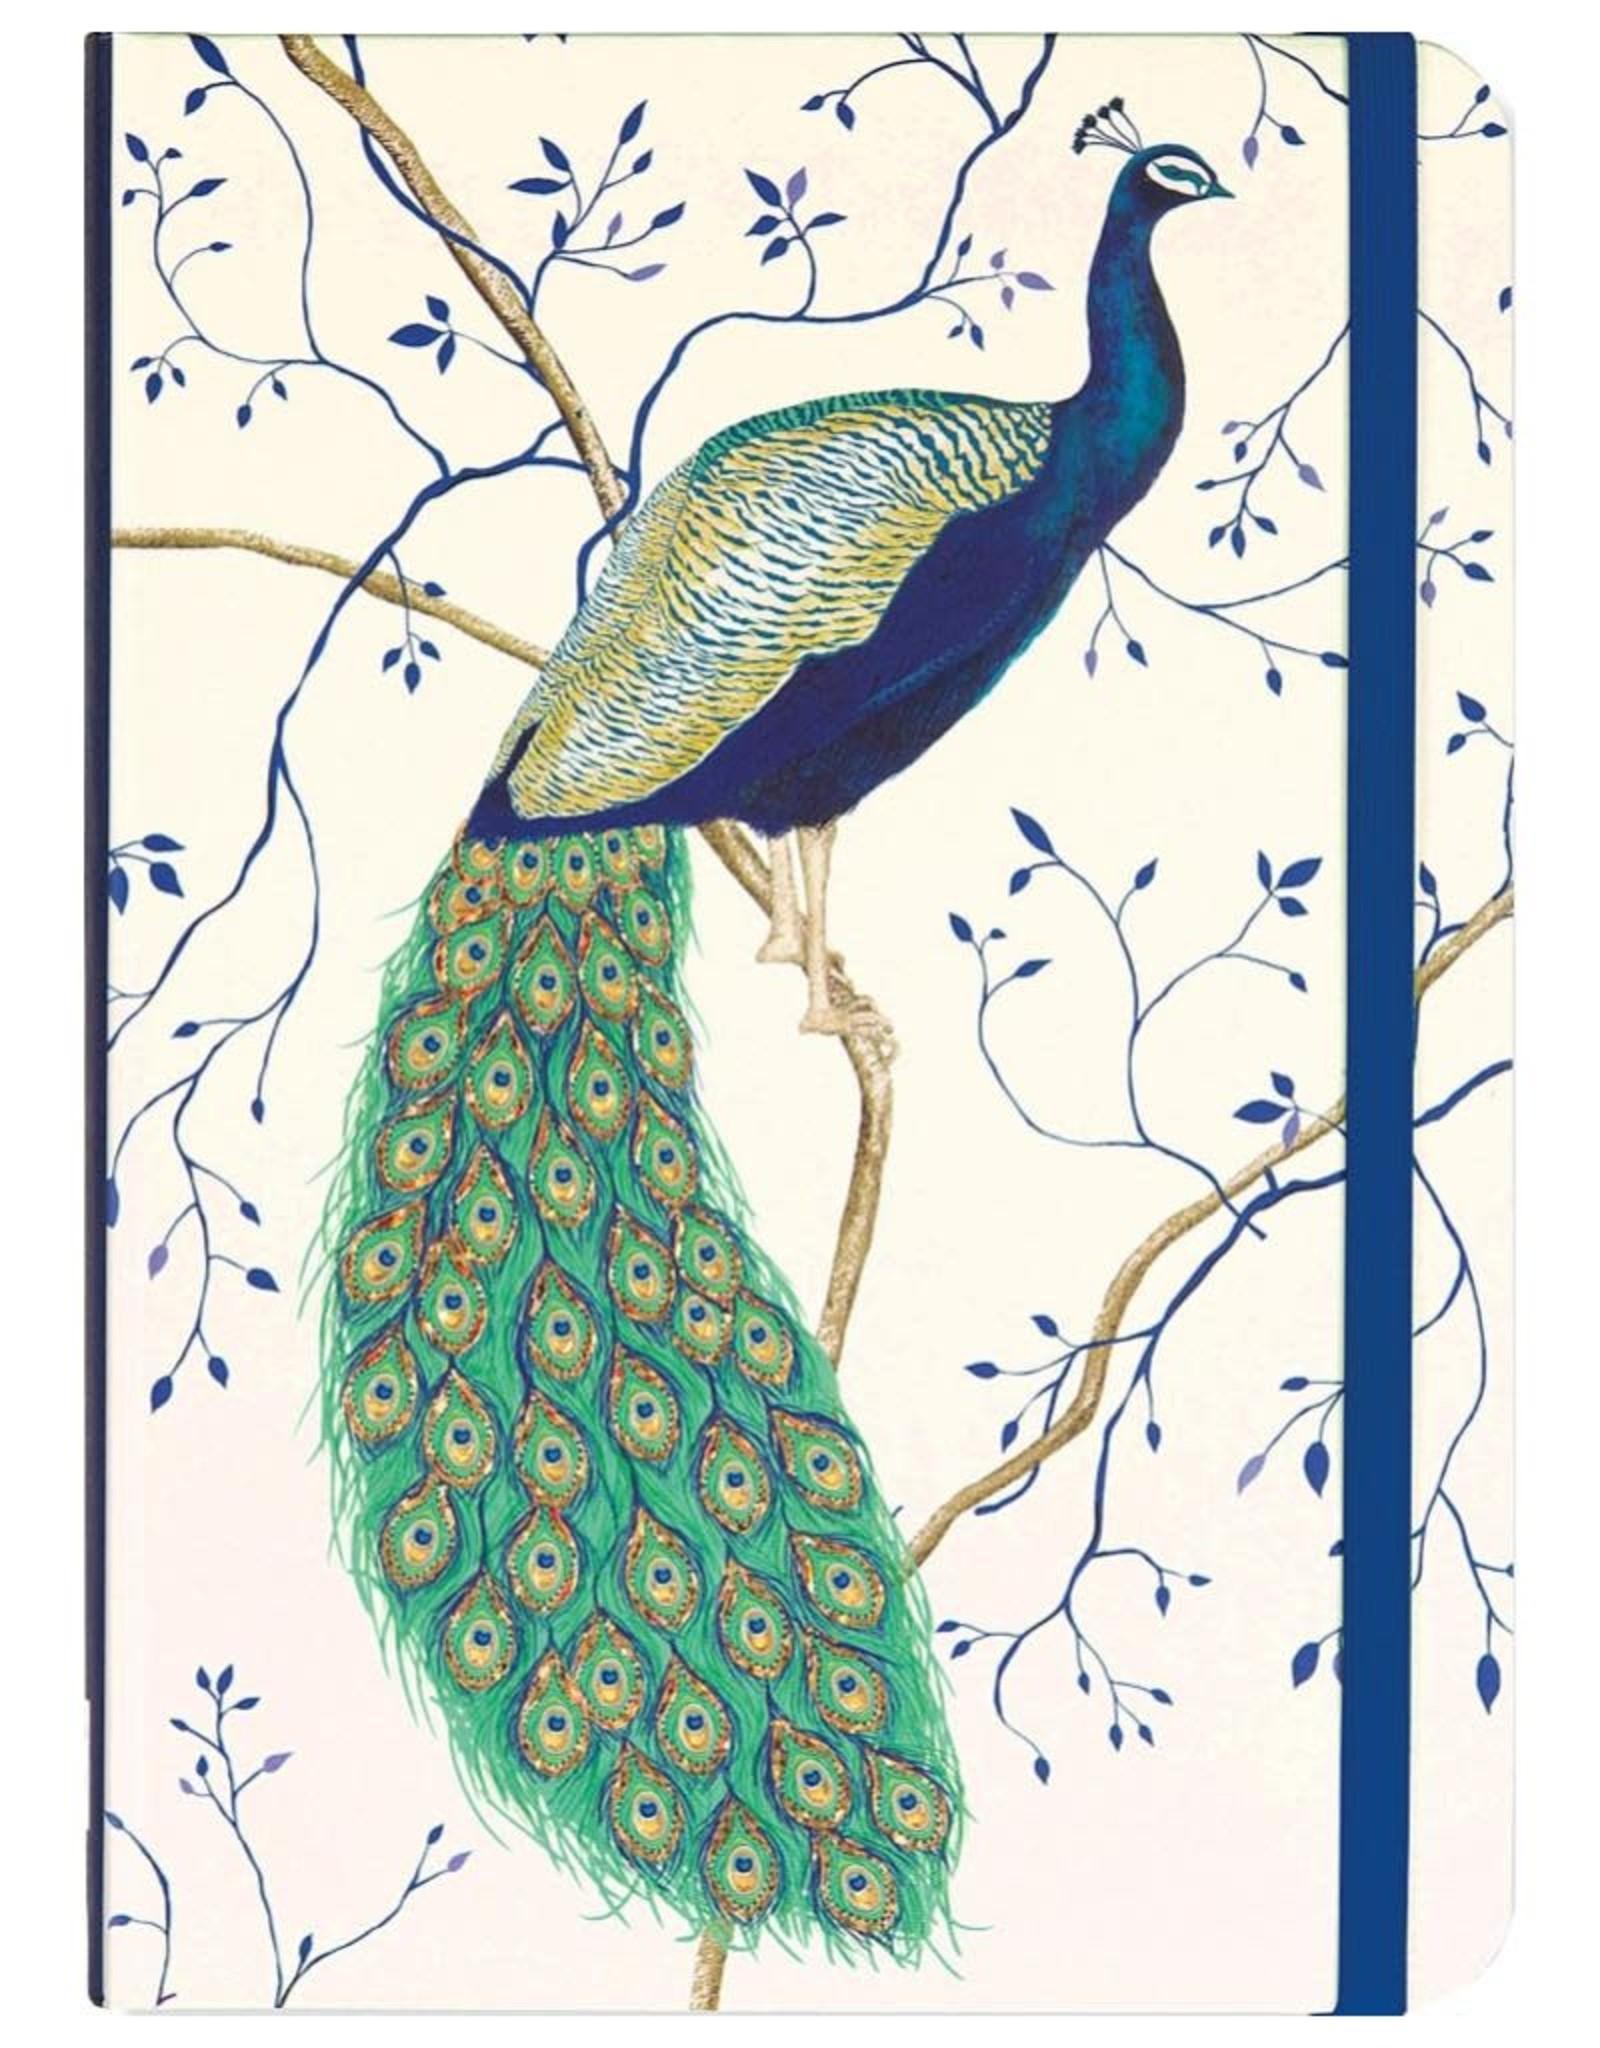 Peter Pauper Peacock Small Journal